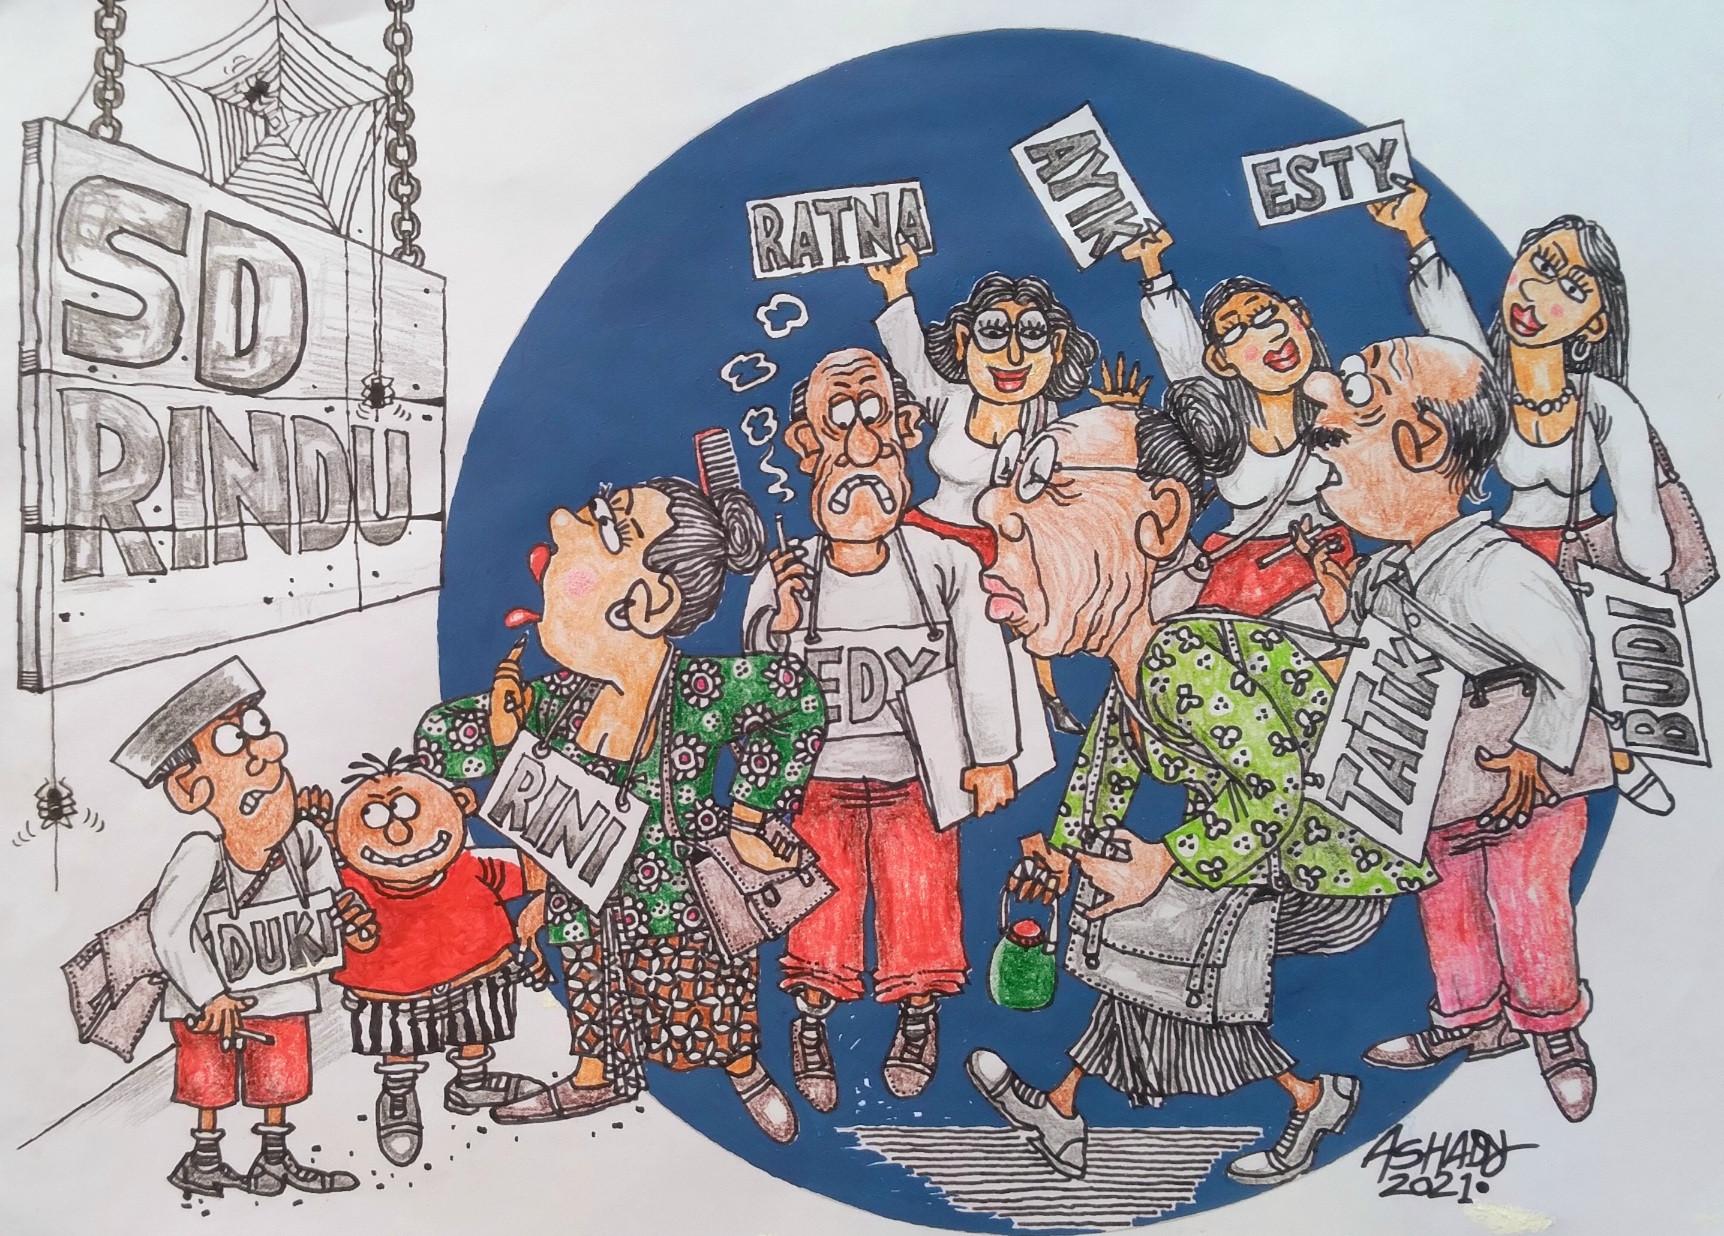 Sekolah Tatap Muka. Karikatur oleh Ashady - JPNN.com